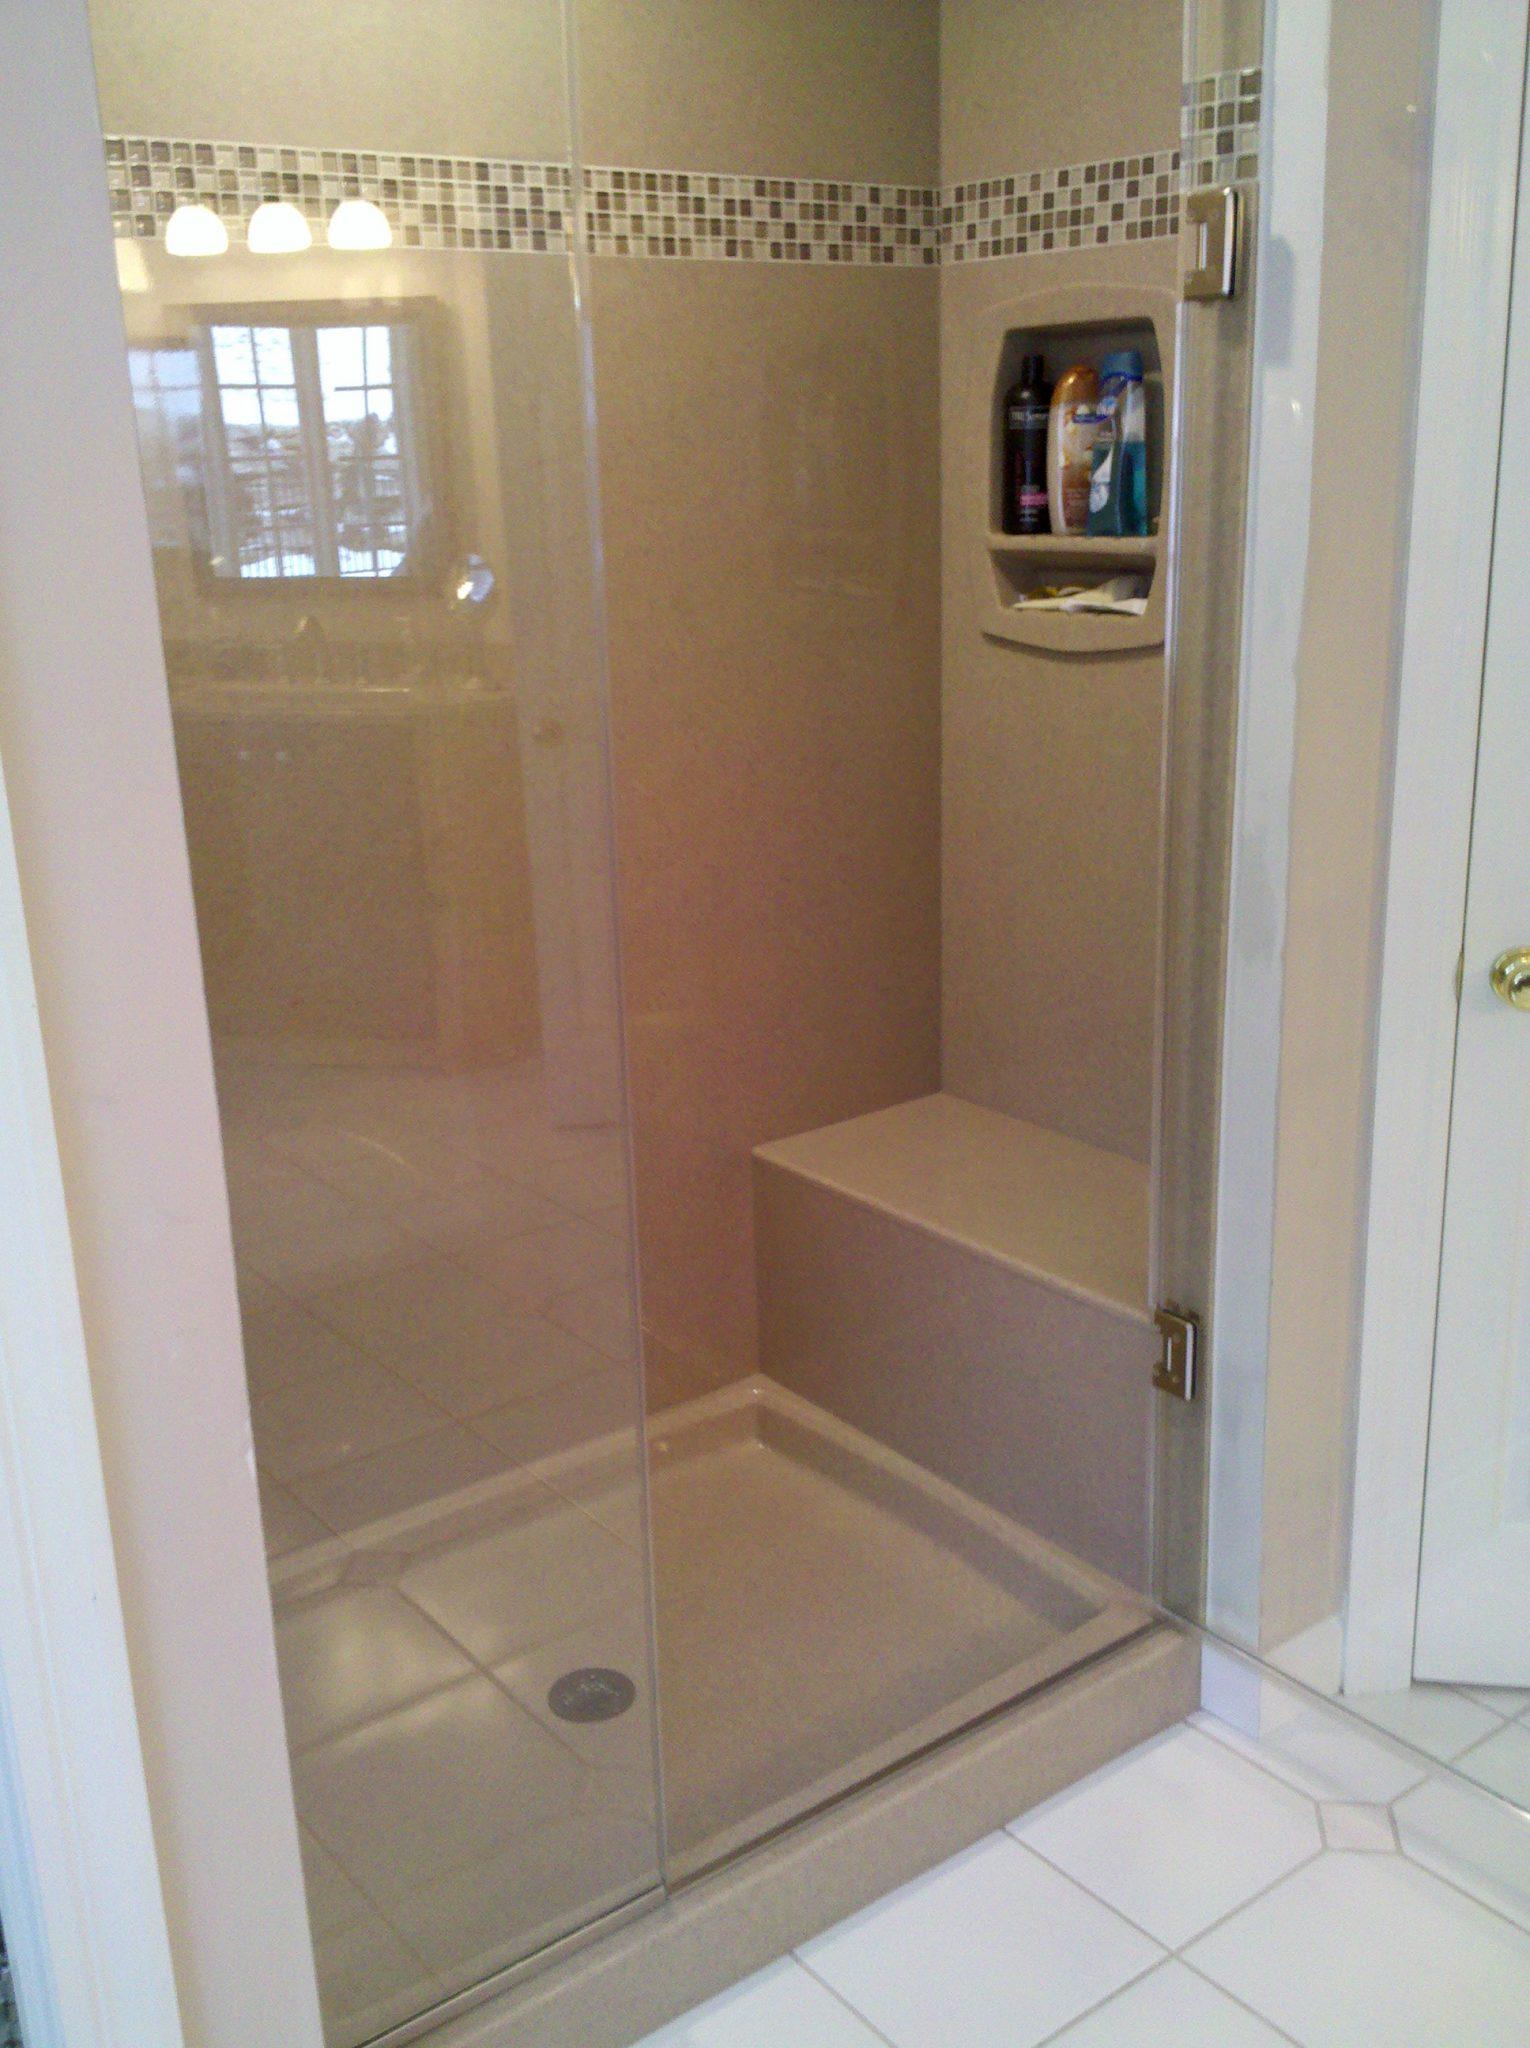 Luxbathadmin Author At Luxury Bathroom Remodeling One Day Bath - Onyx bathroom remodel